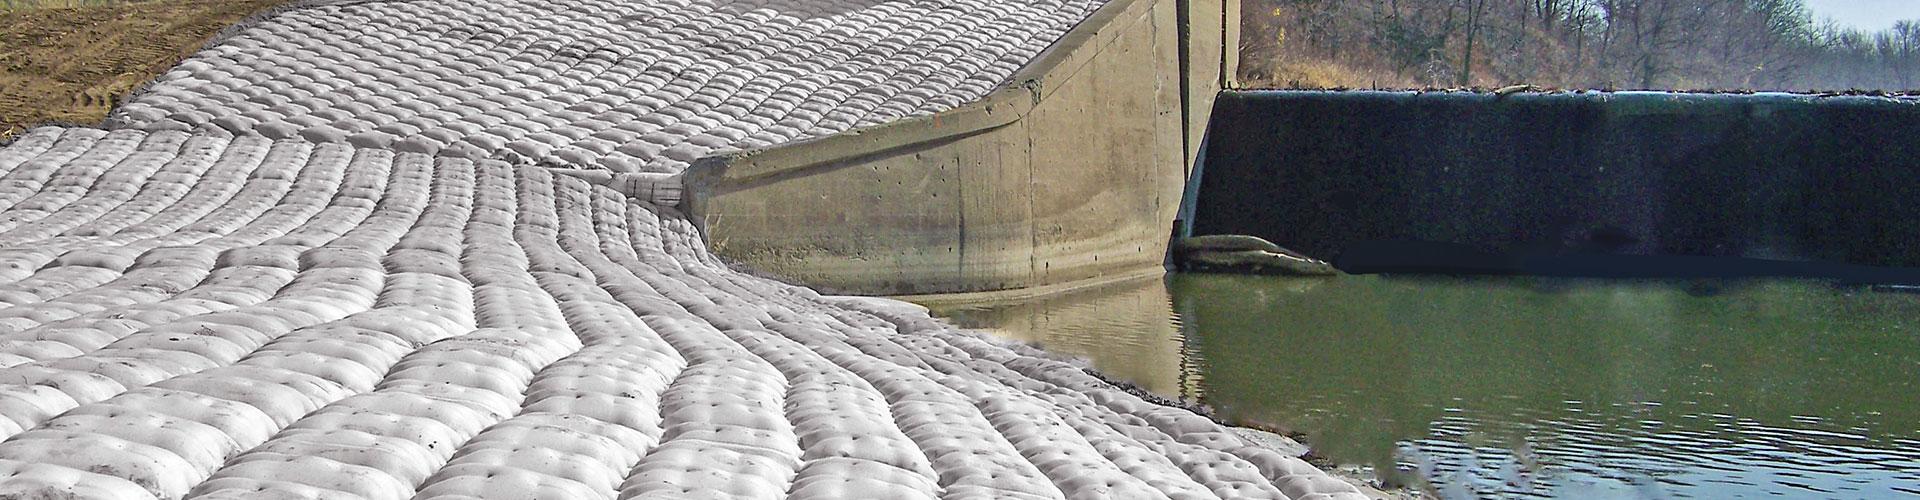 dam construction, scour remediation, scour control, fabric formed articulating block mats